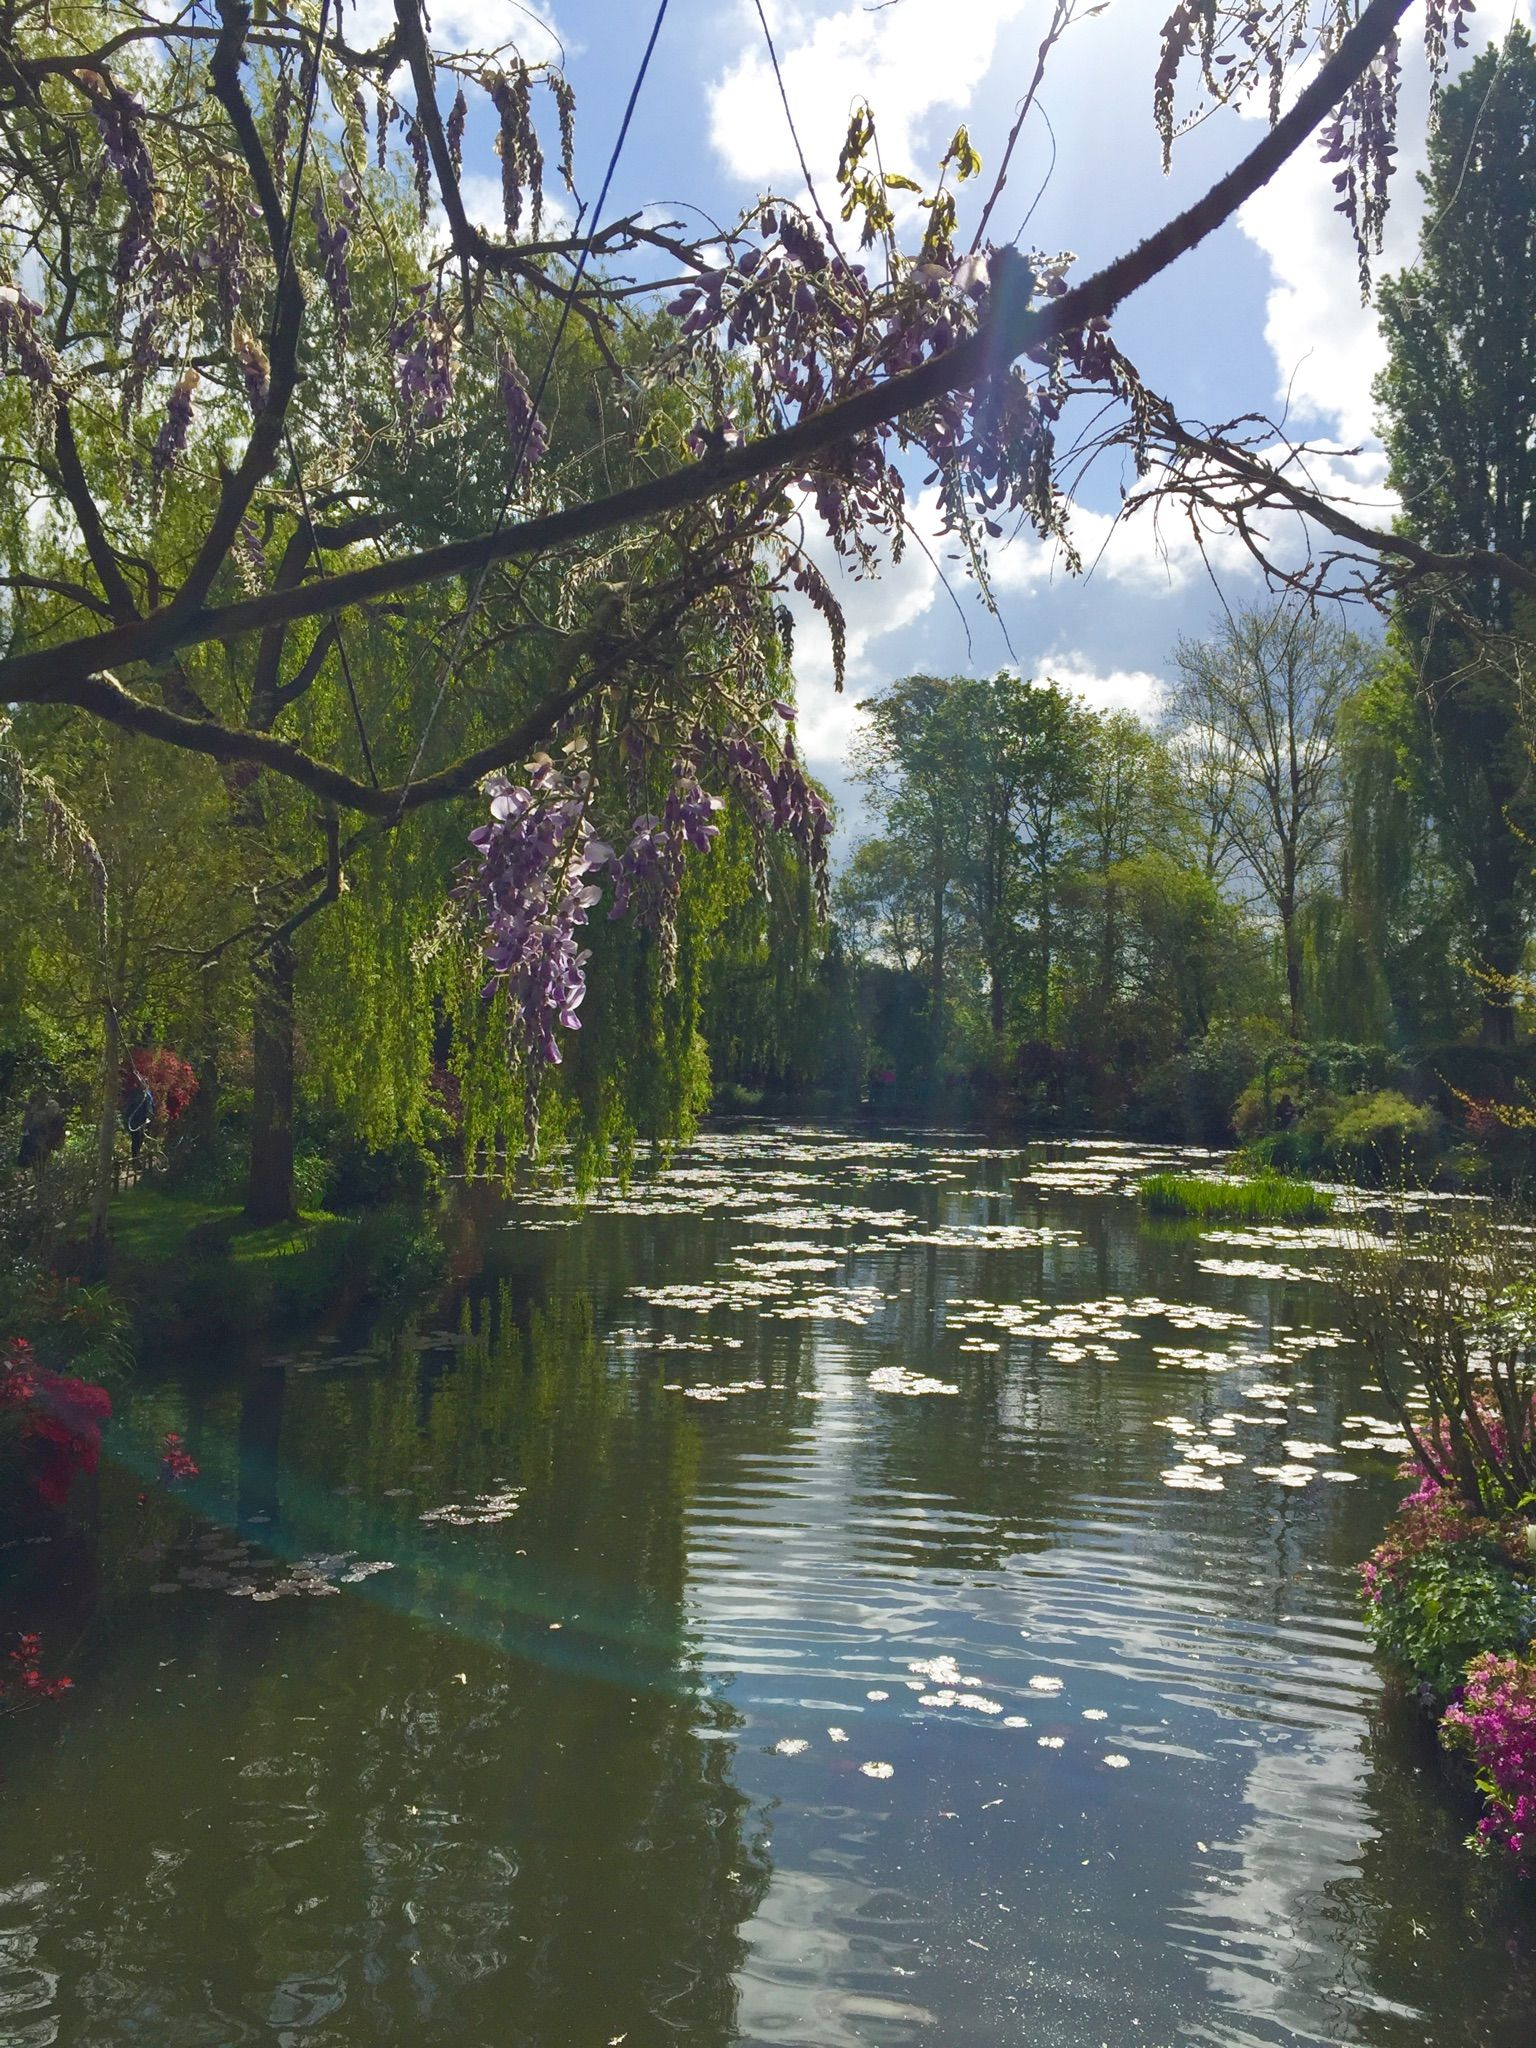 The eternal garden - Monet's Garden in Giverny